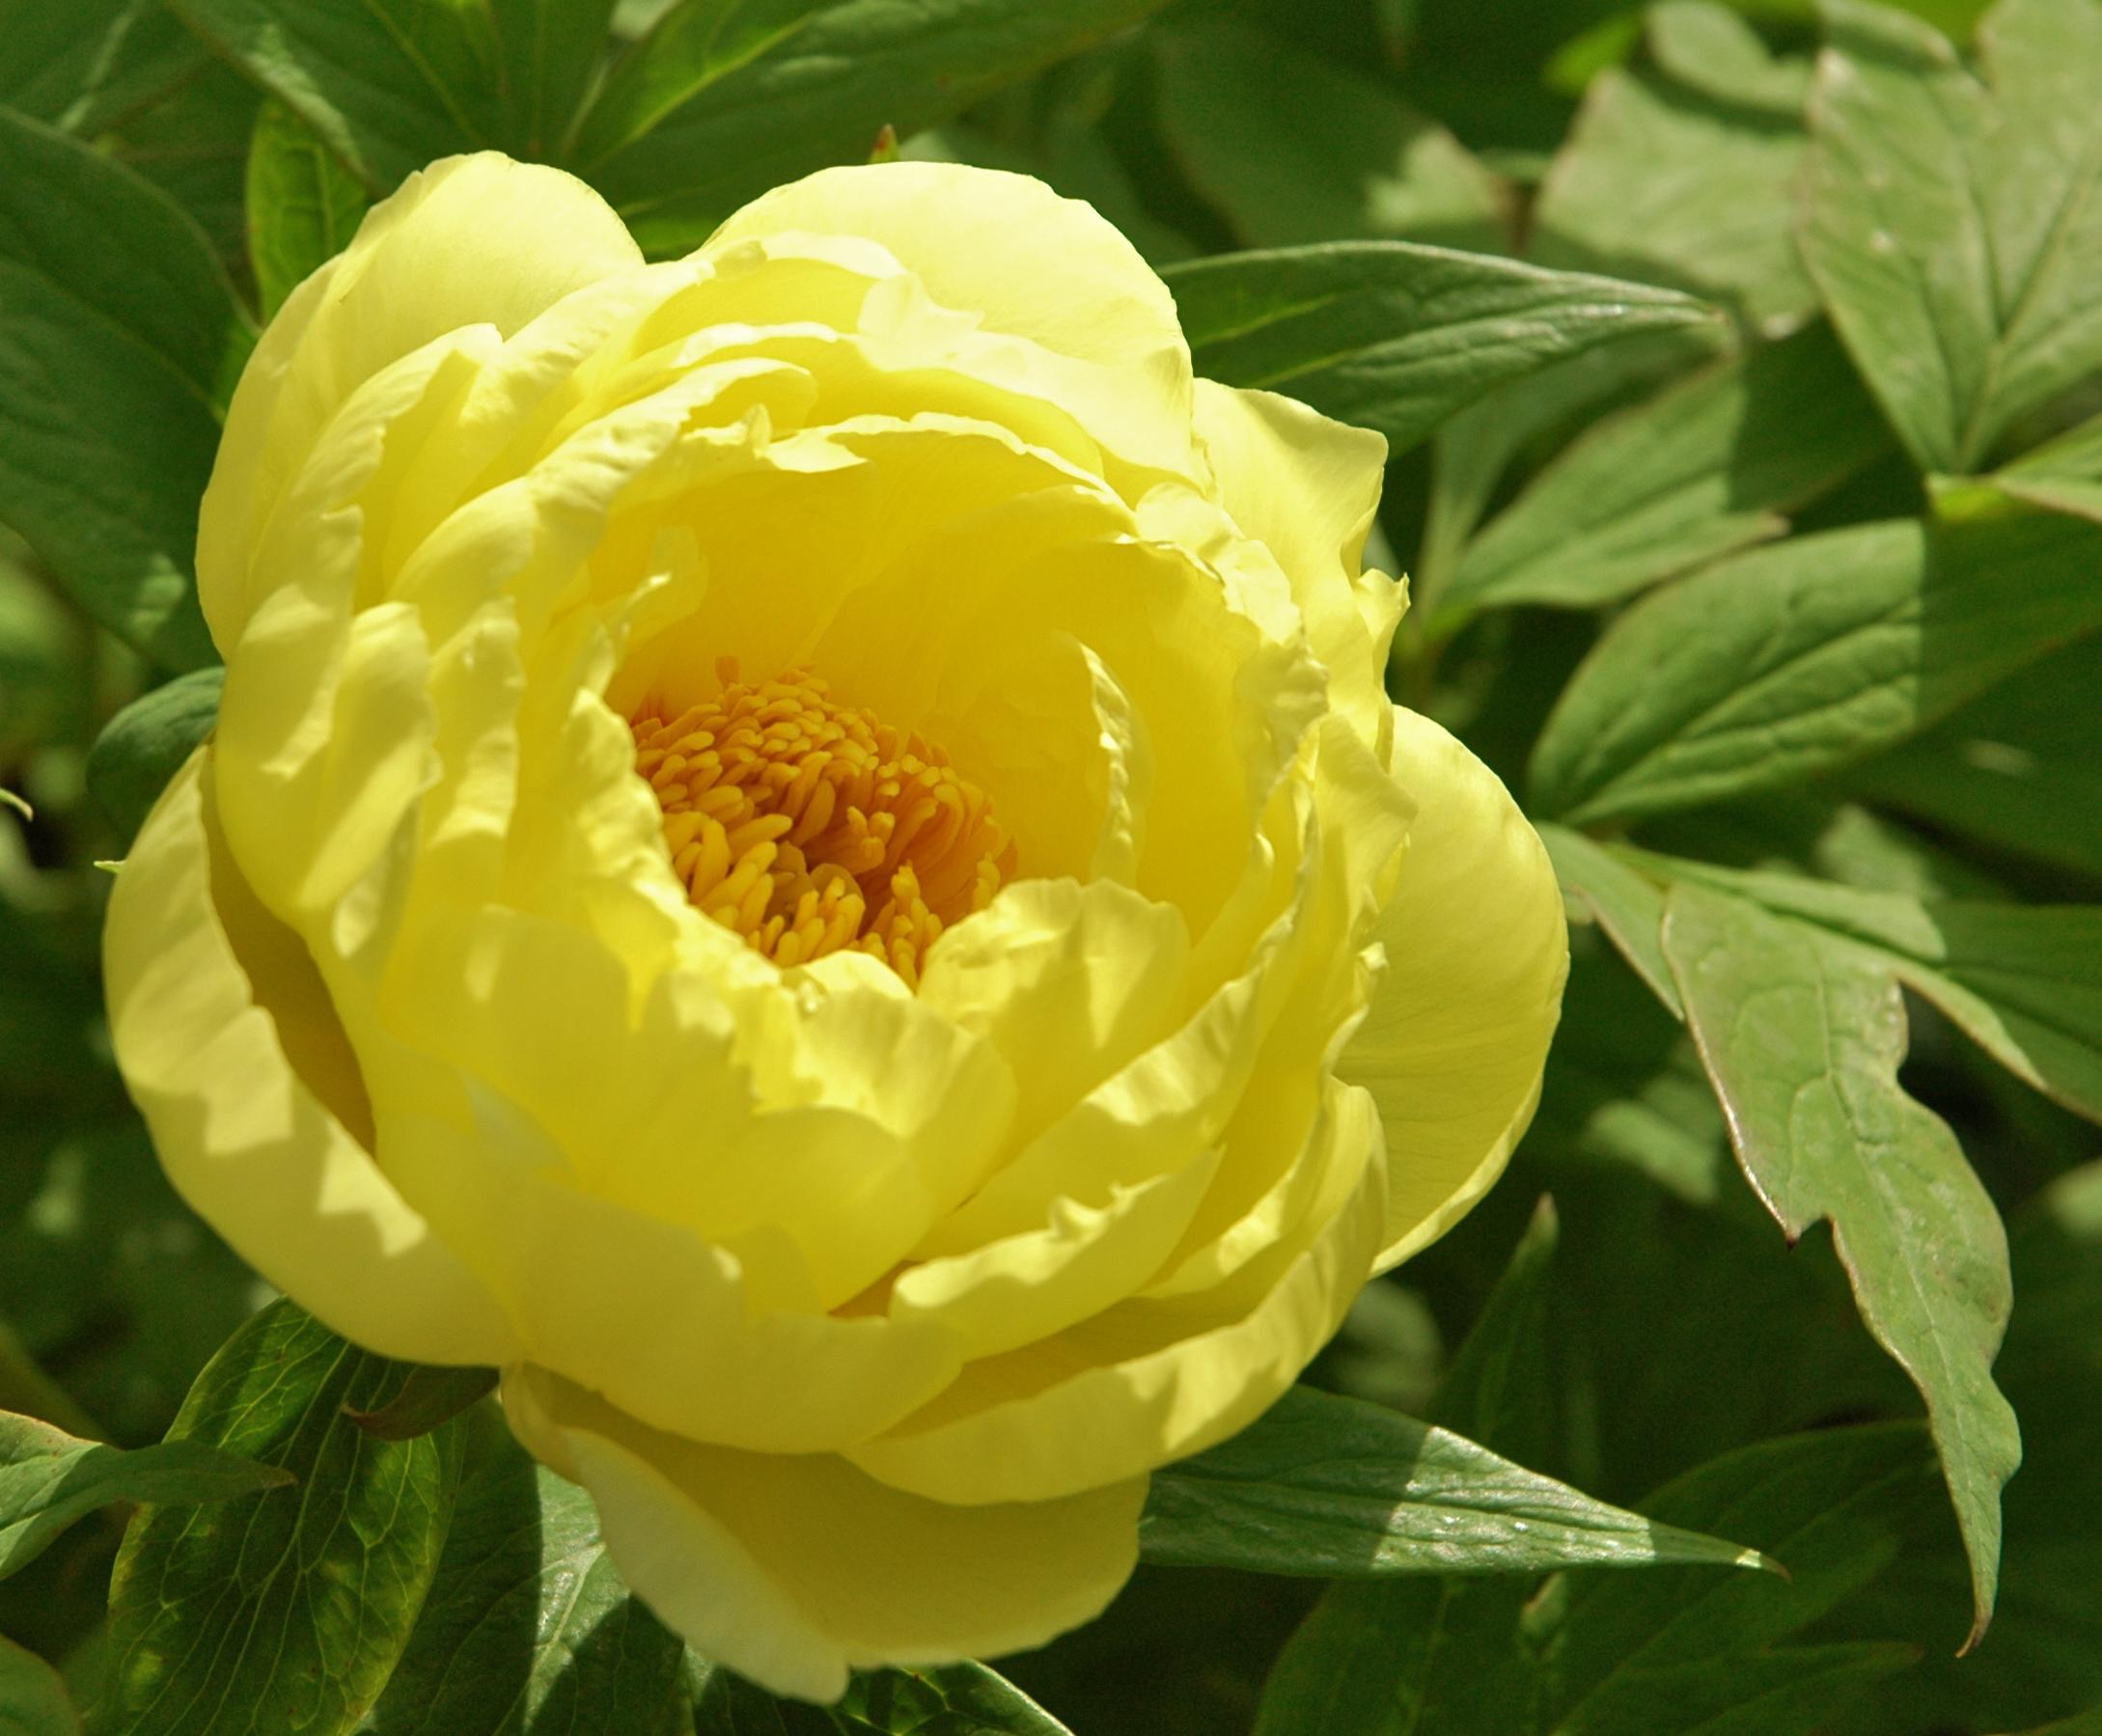 Yellow Flower Power Bmore Energy